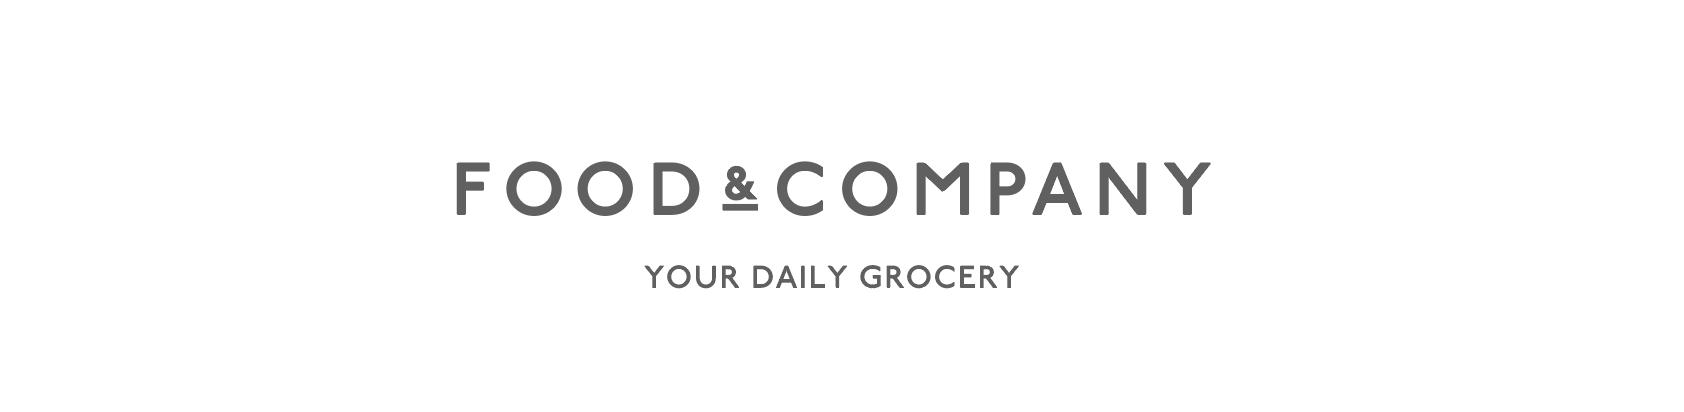 FOOD&COMPANY ONLINE